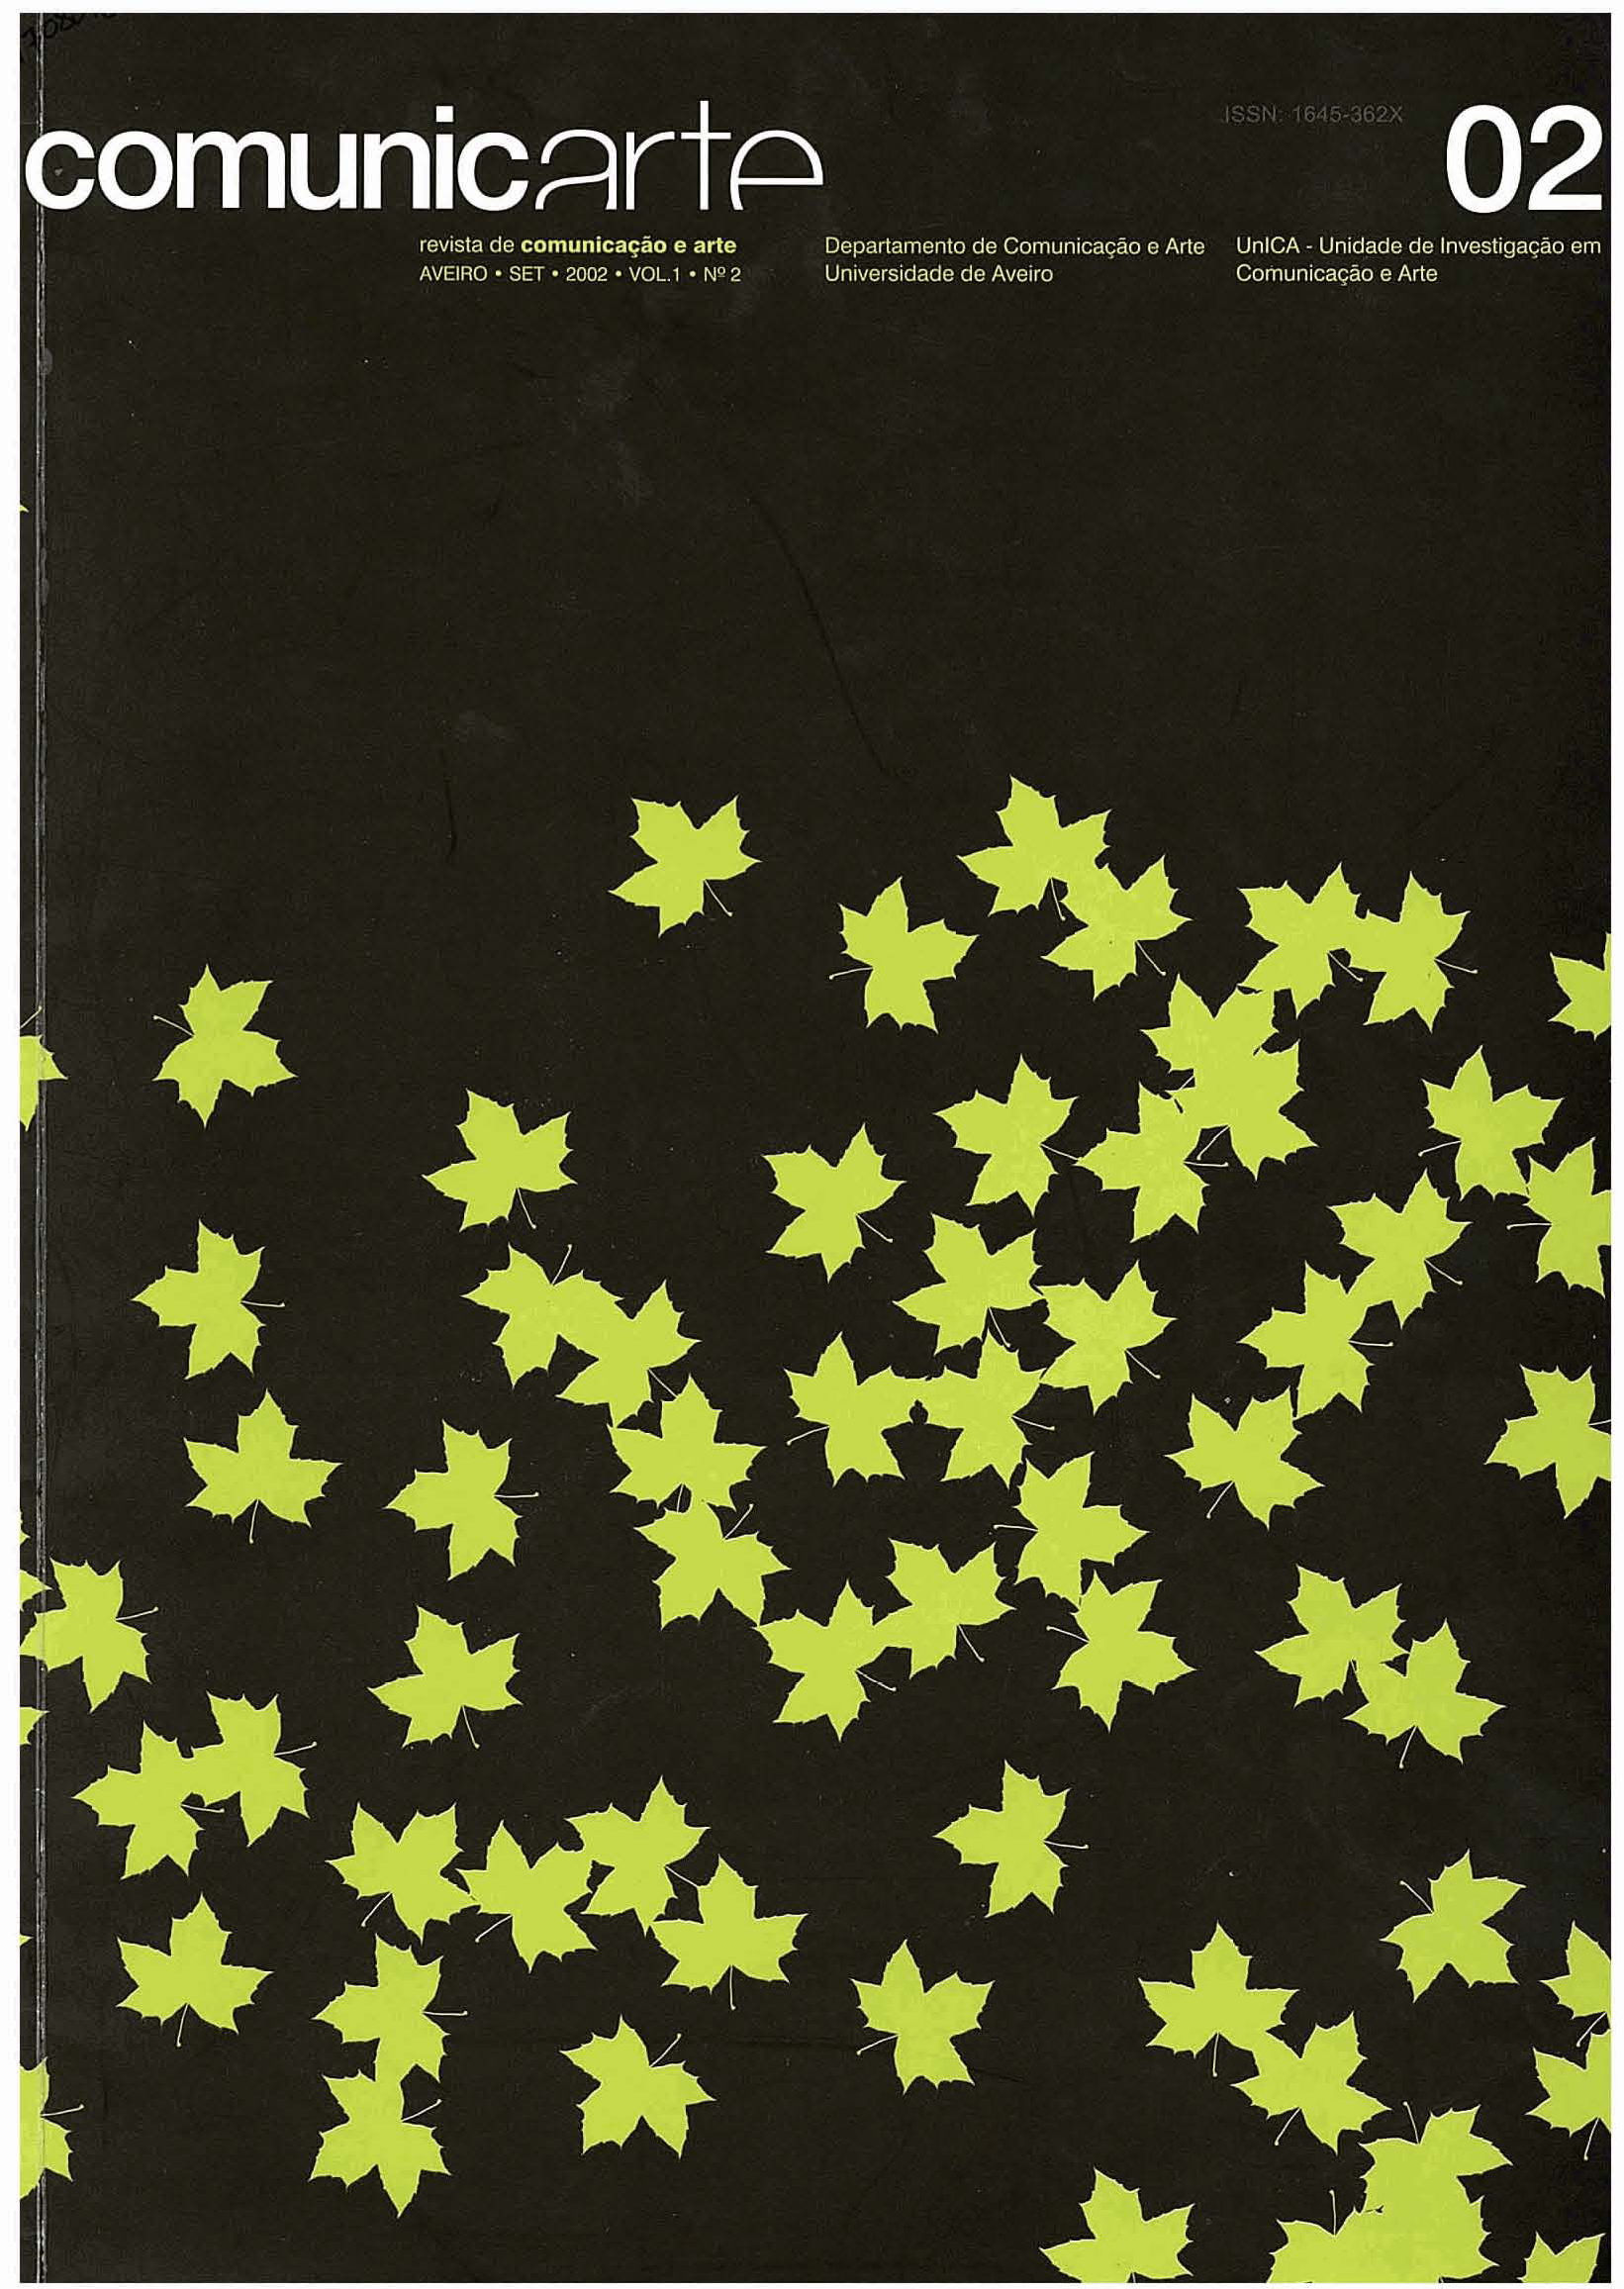 Capa do volume 1, número 2 (2002) da revista Comunicarte.